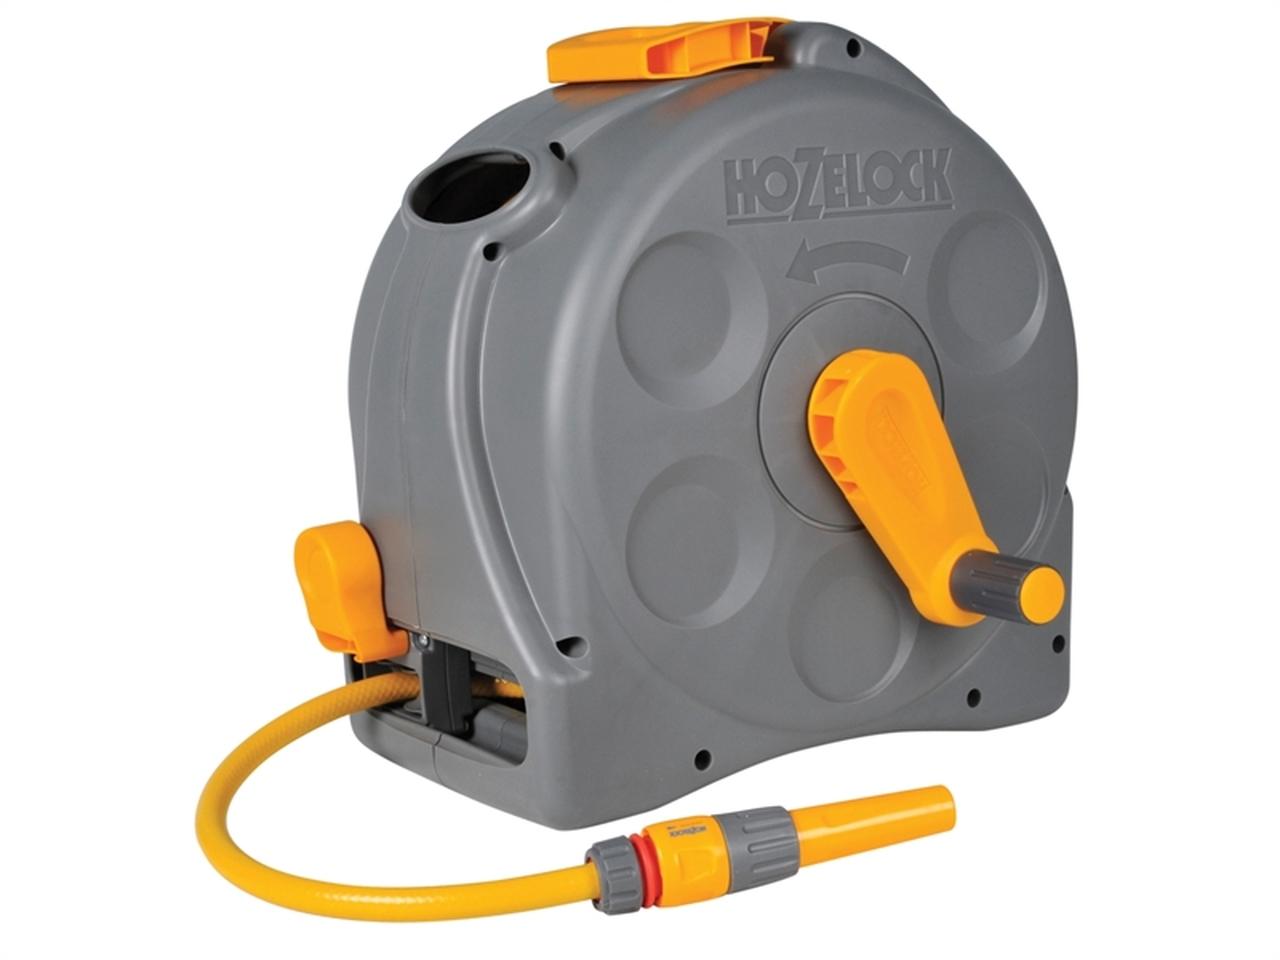 HOZELOCK 2415 2-IN-1 COMPACT HOSE REEL PLUS 25 METRE OF STARTER HOSE